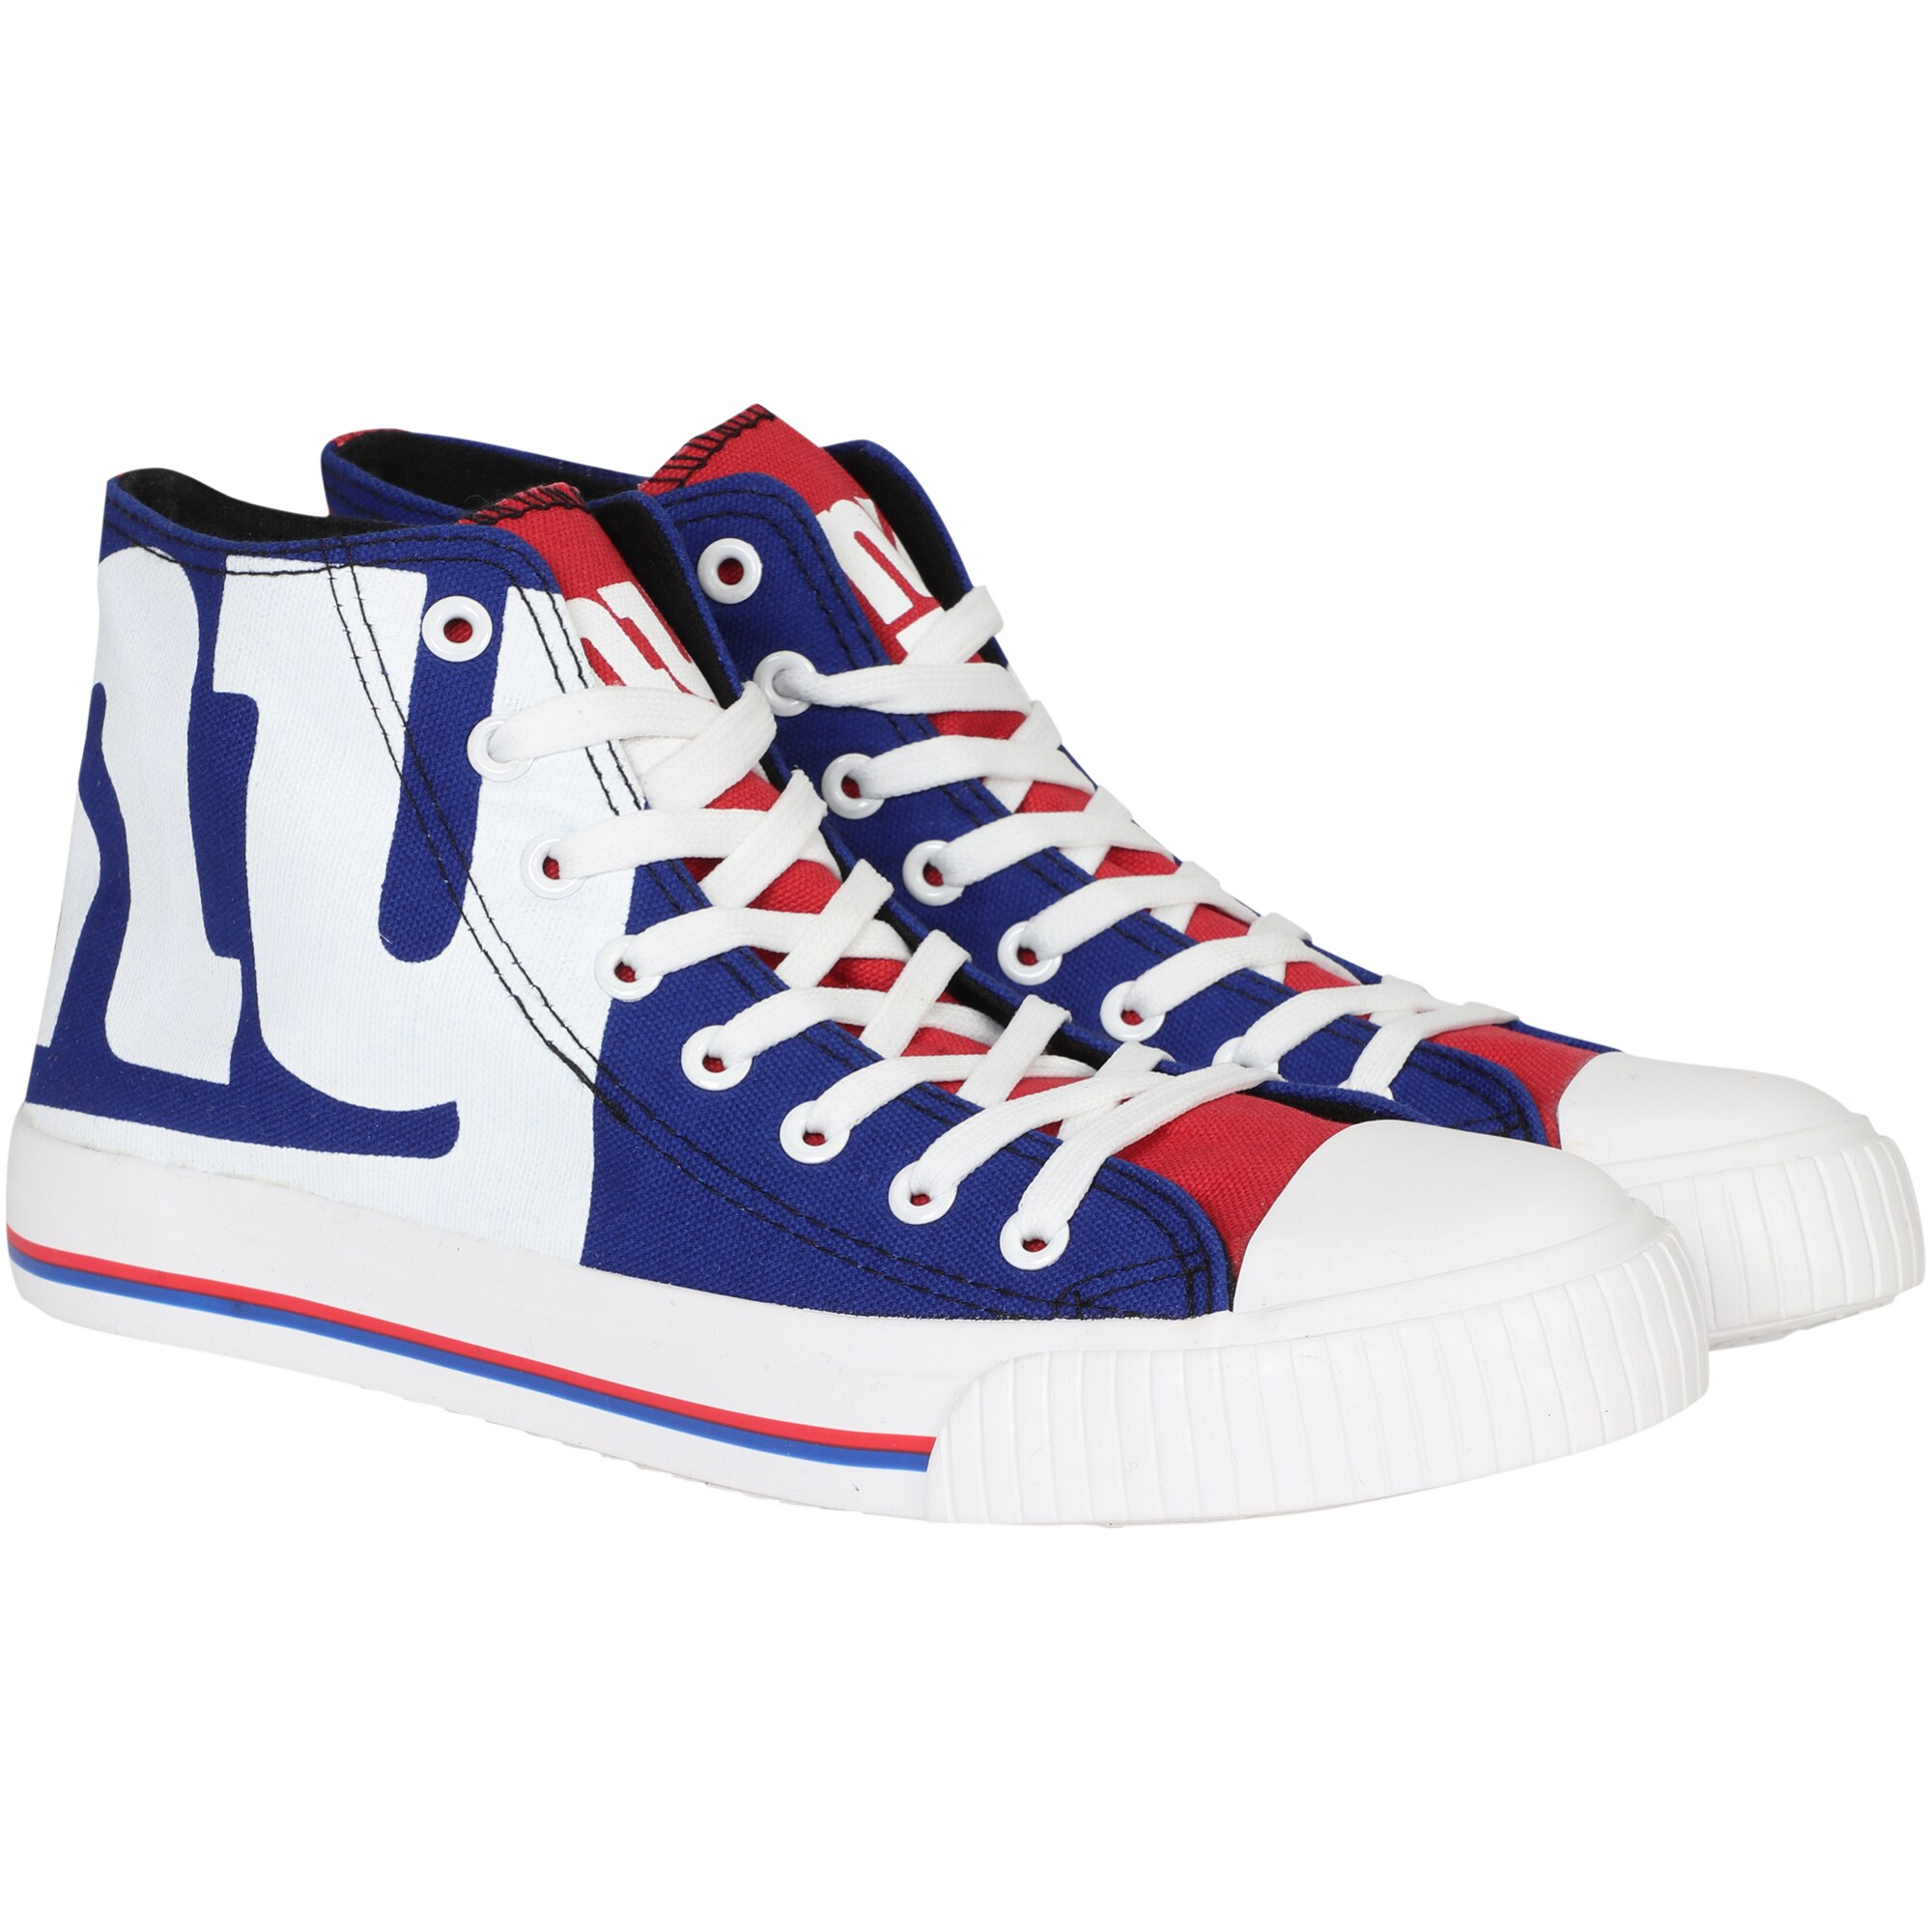 New York Giants Big Logo High Top Sneakers